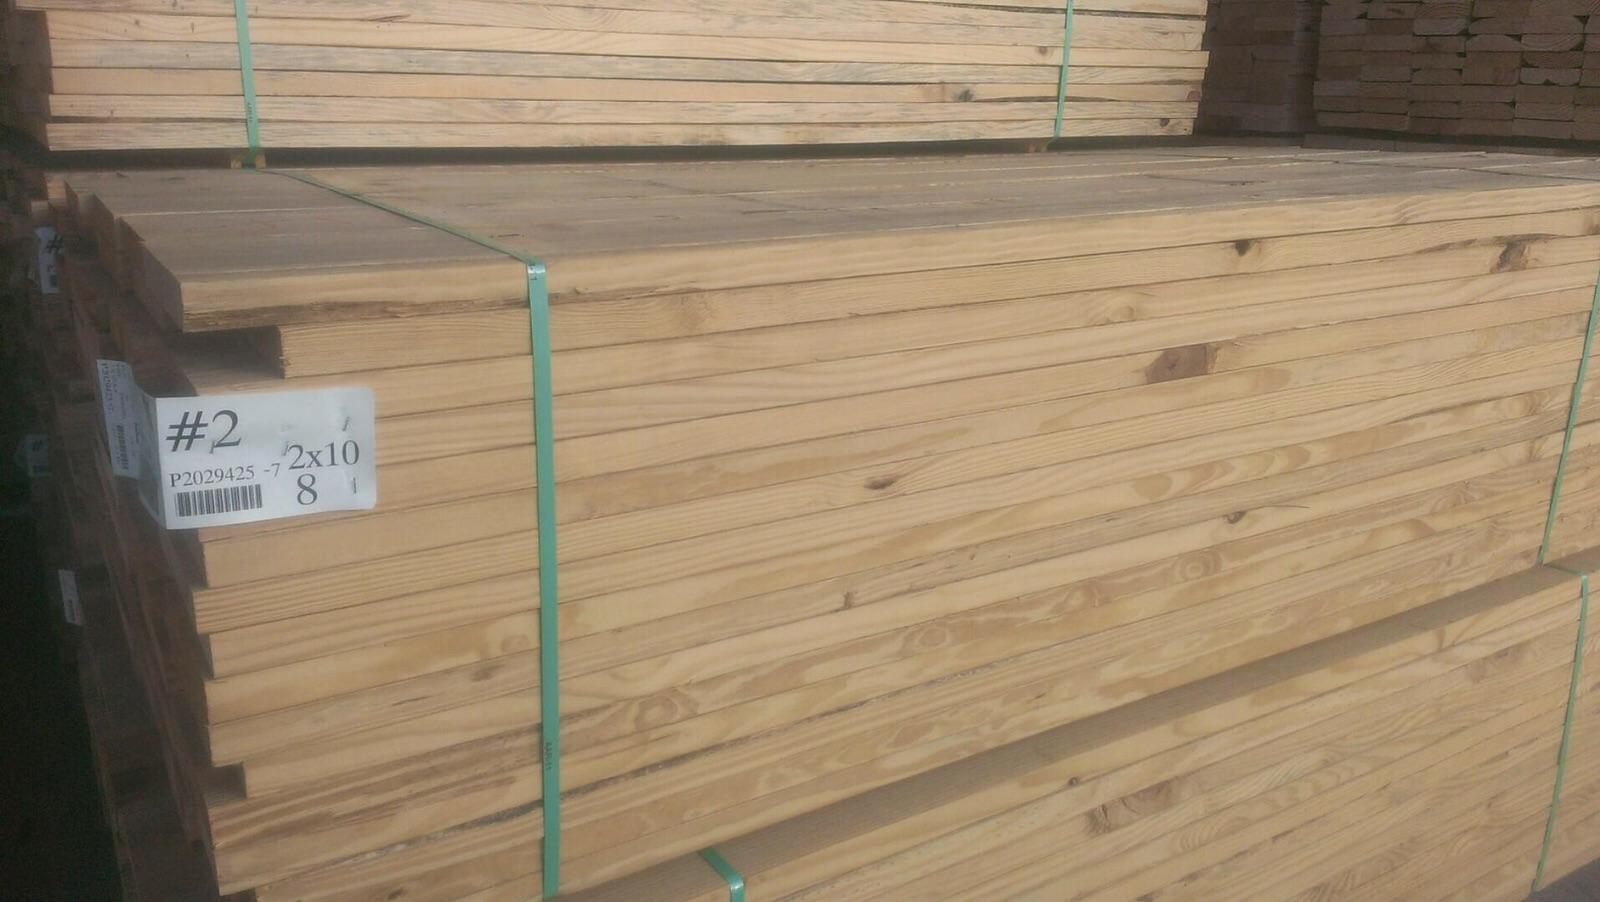 Southern Yellow Pine Lumber